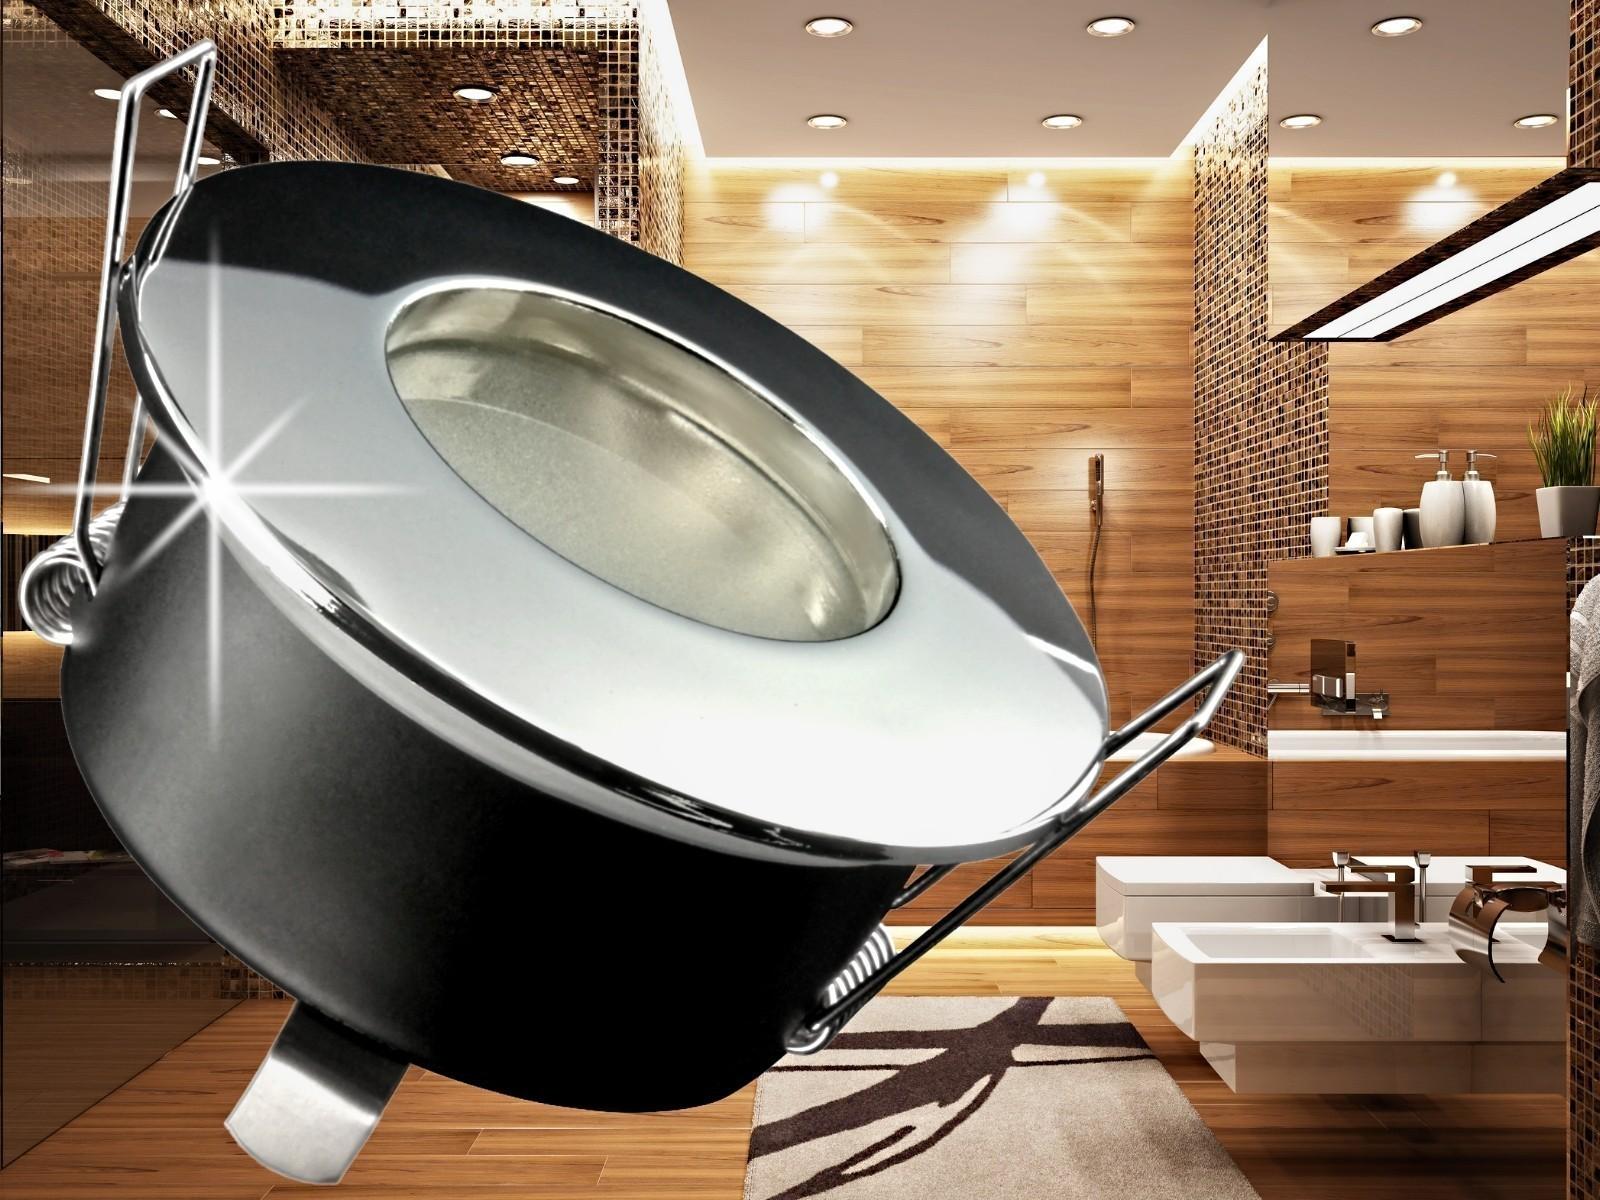 rw 1 feuchtraum led einbaustrahler bad einbauleuchte chrom ip65 3 5w smd led warmweiss gu10. Black Bedroom Furniture Sets. Home Design Ideas